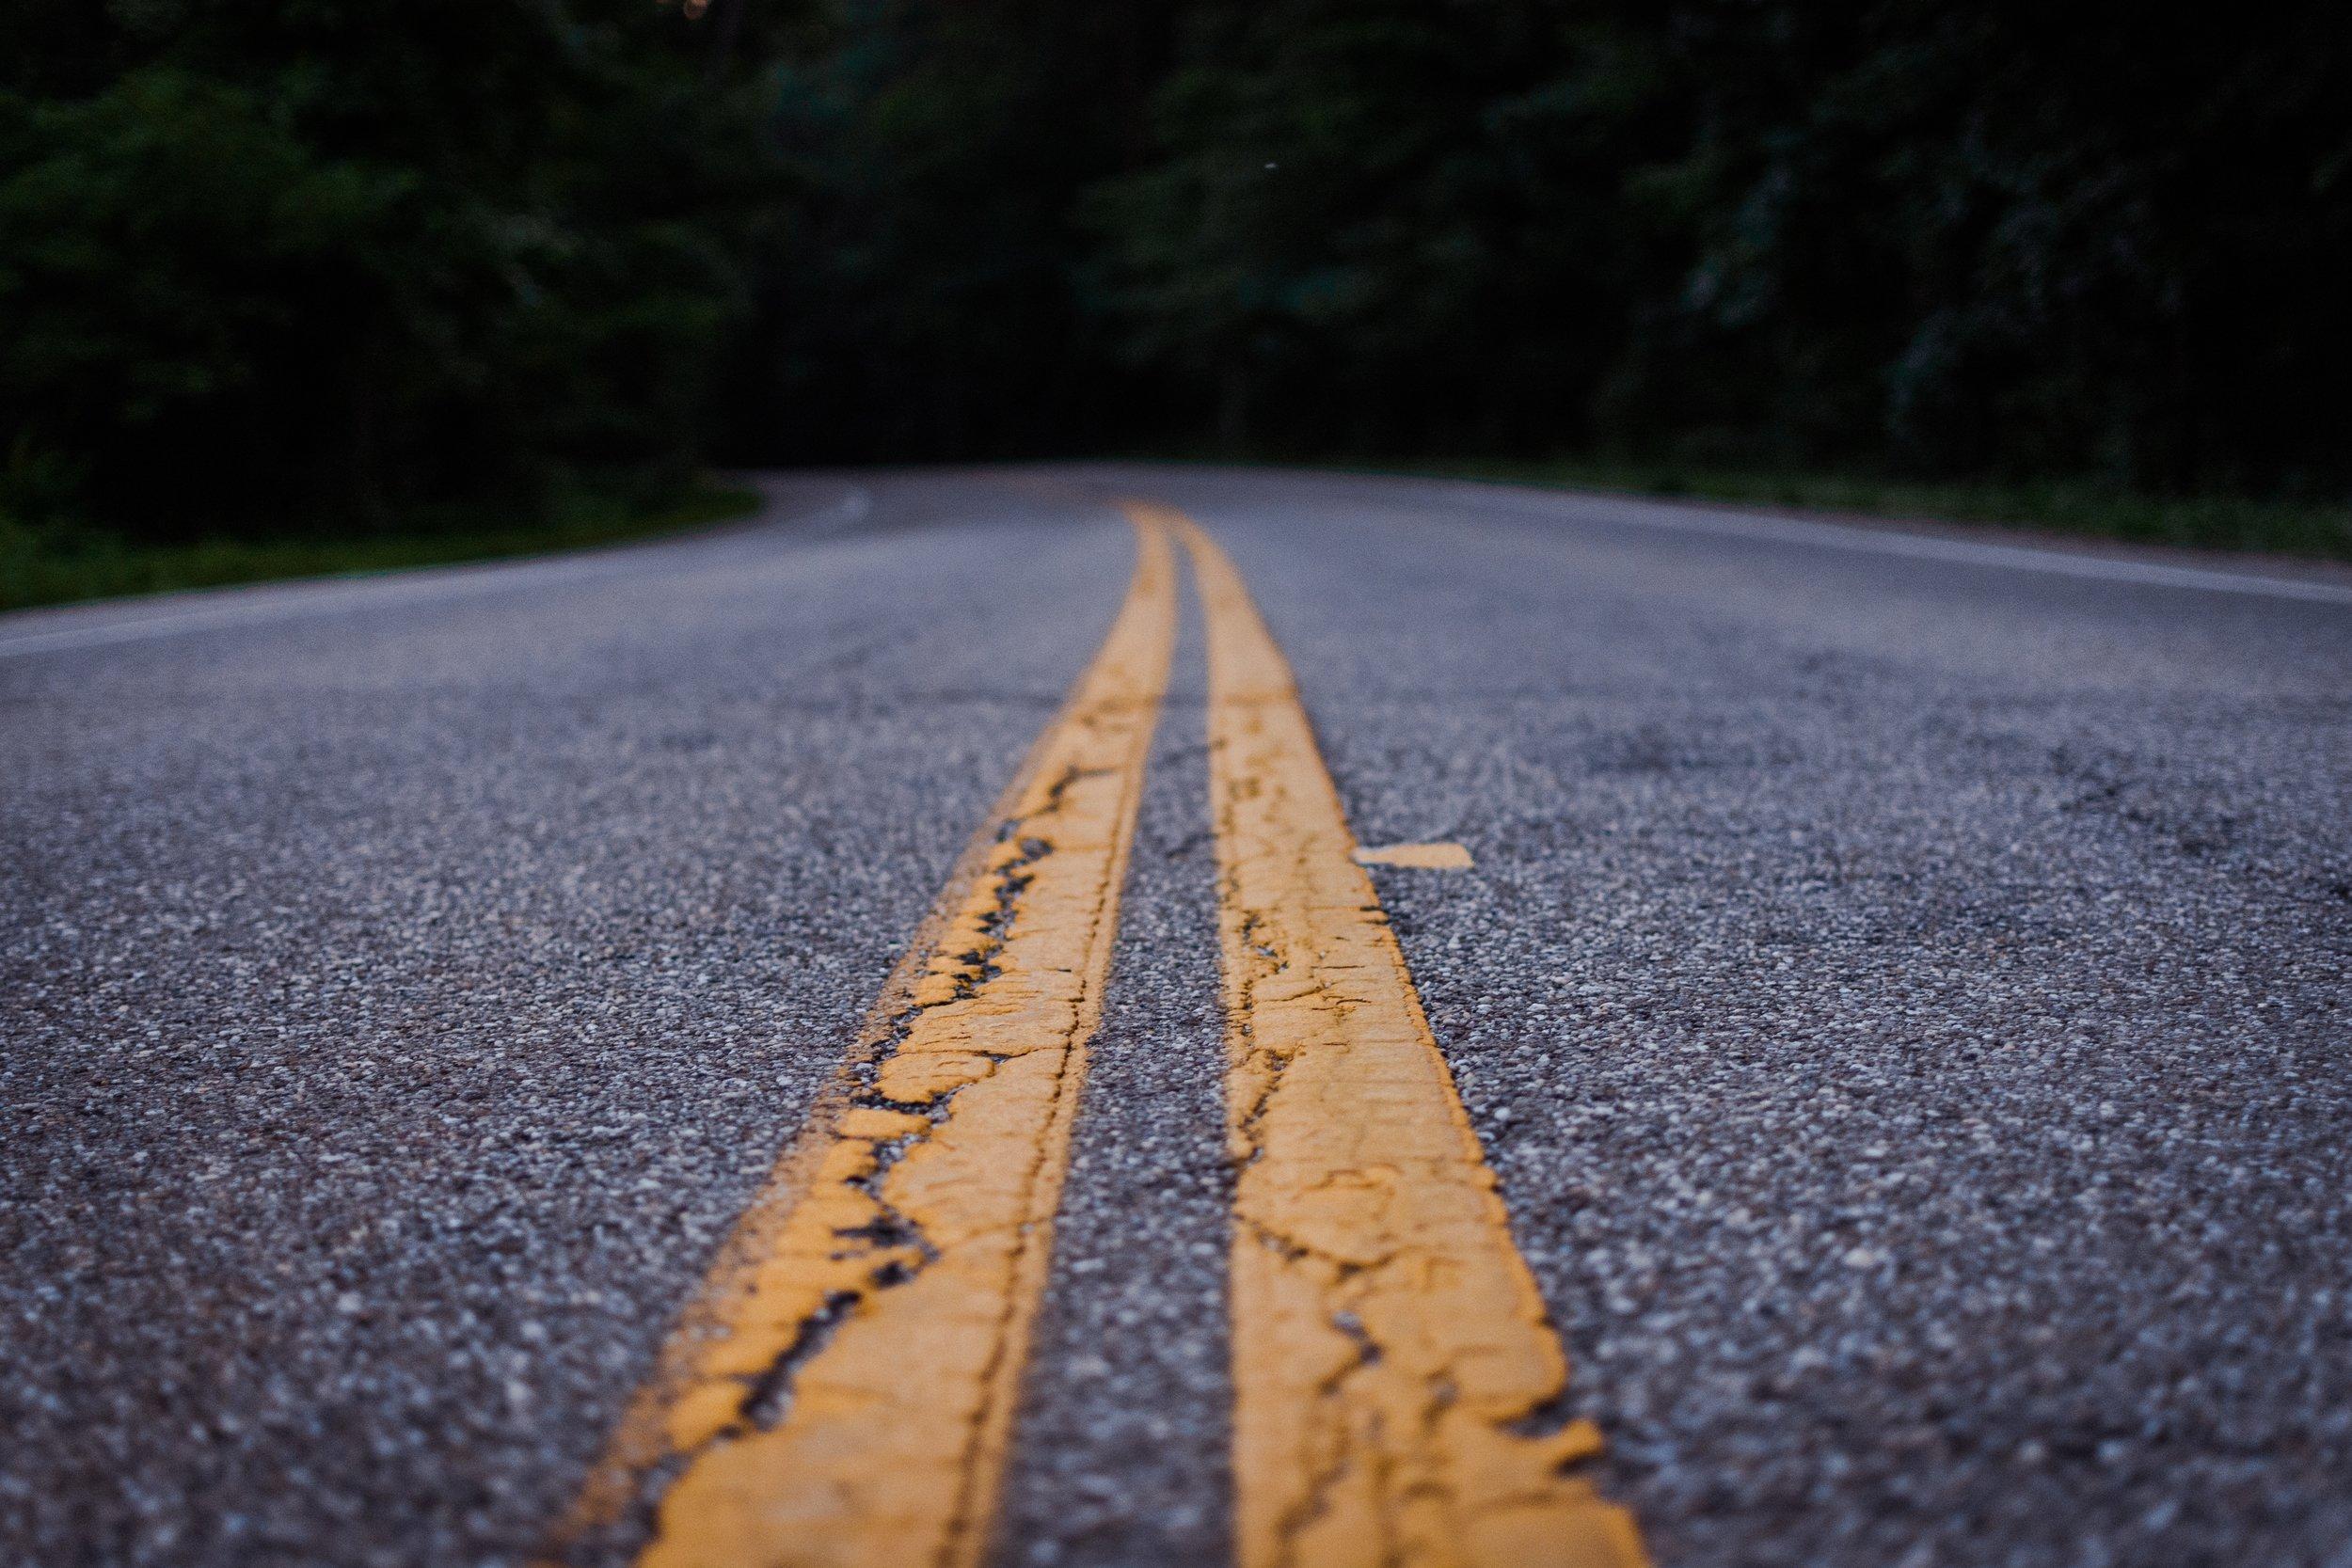 jamie-mission-road-asphalt-bitumen-empty-road-1197095.jpg